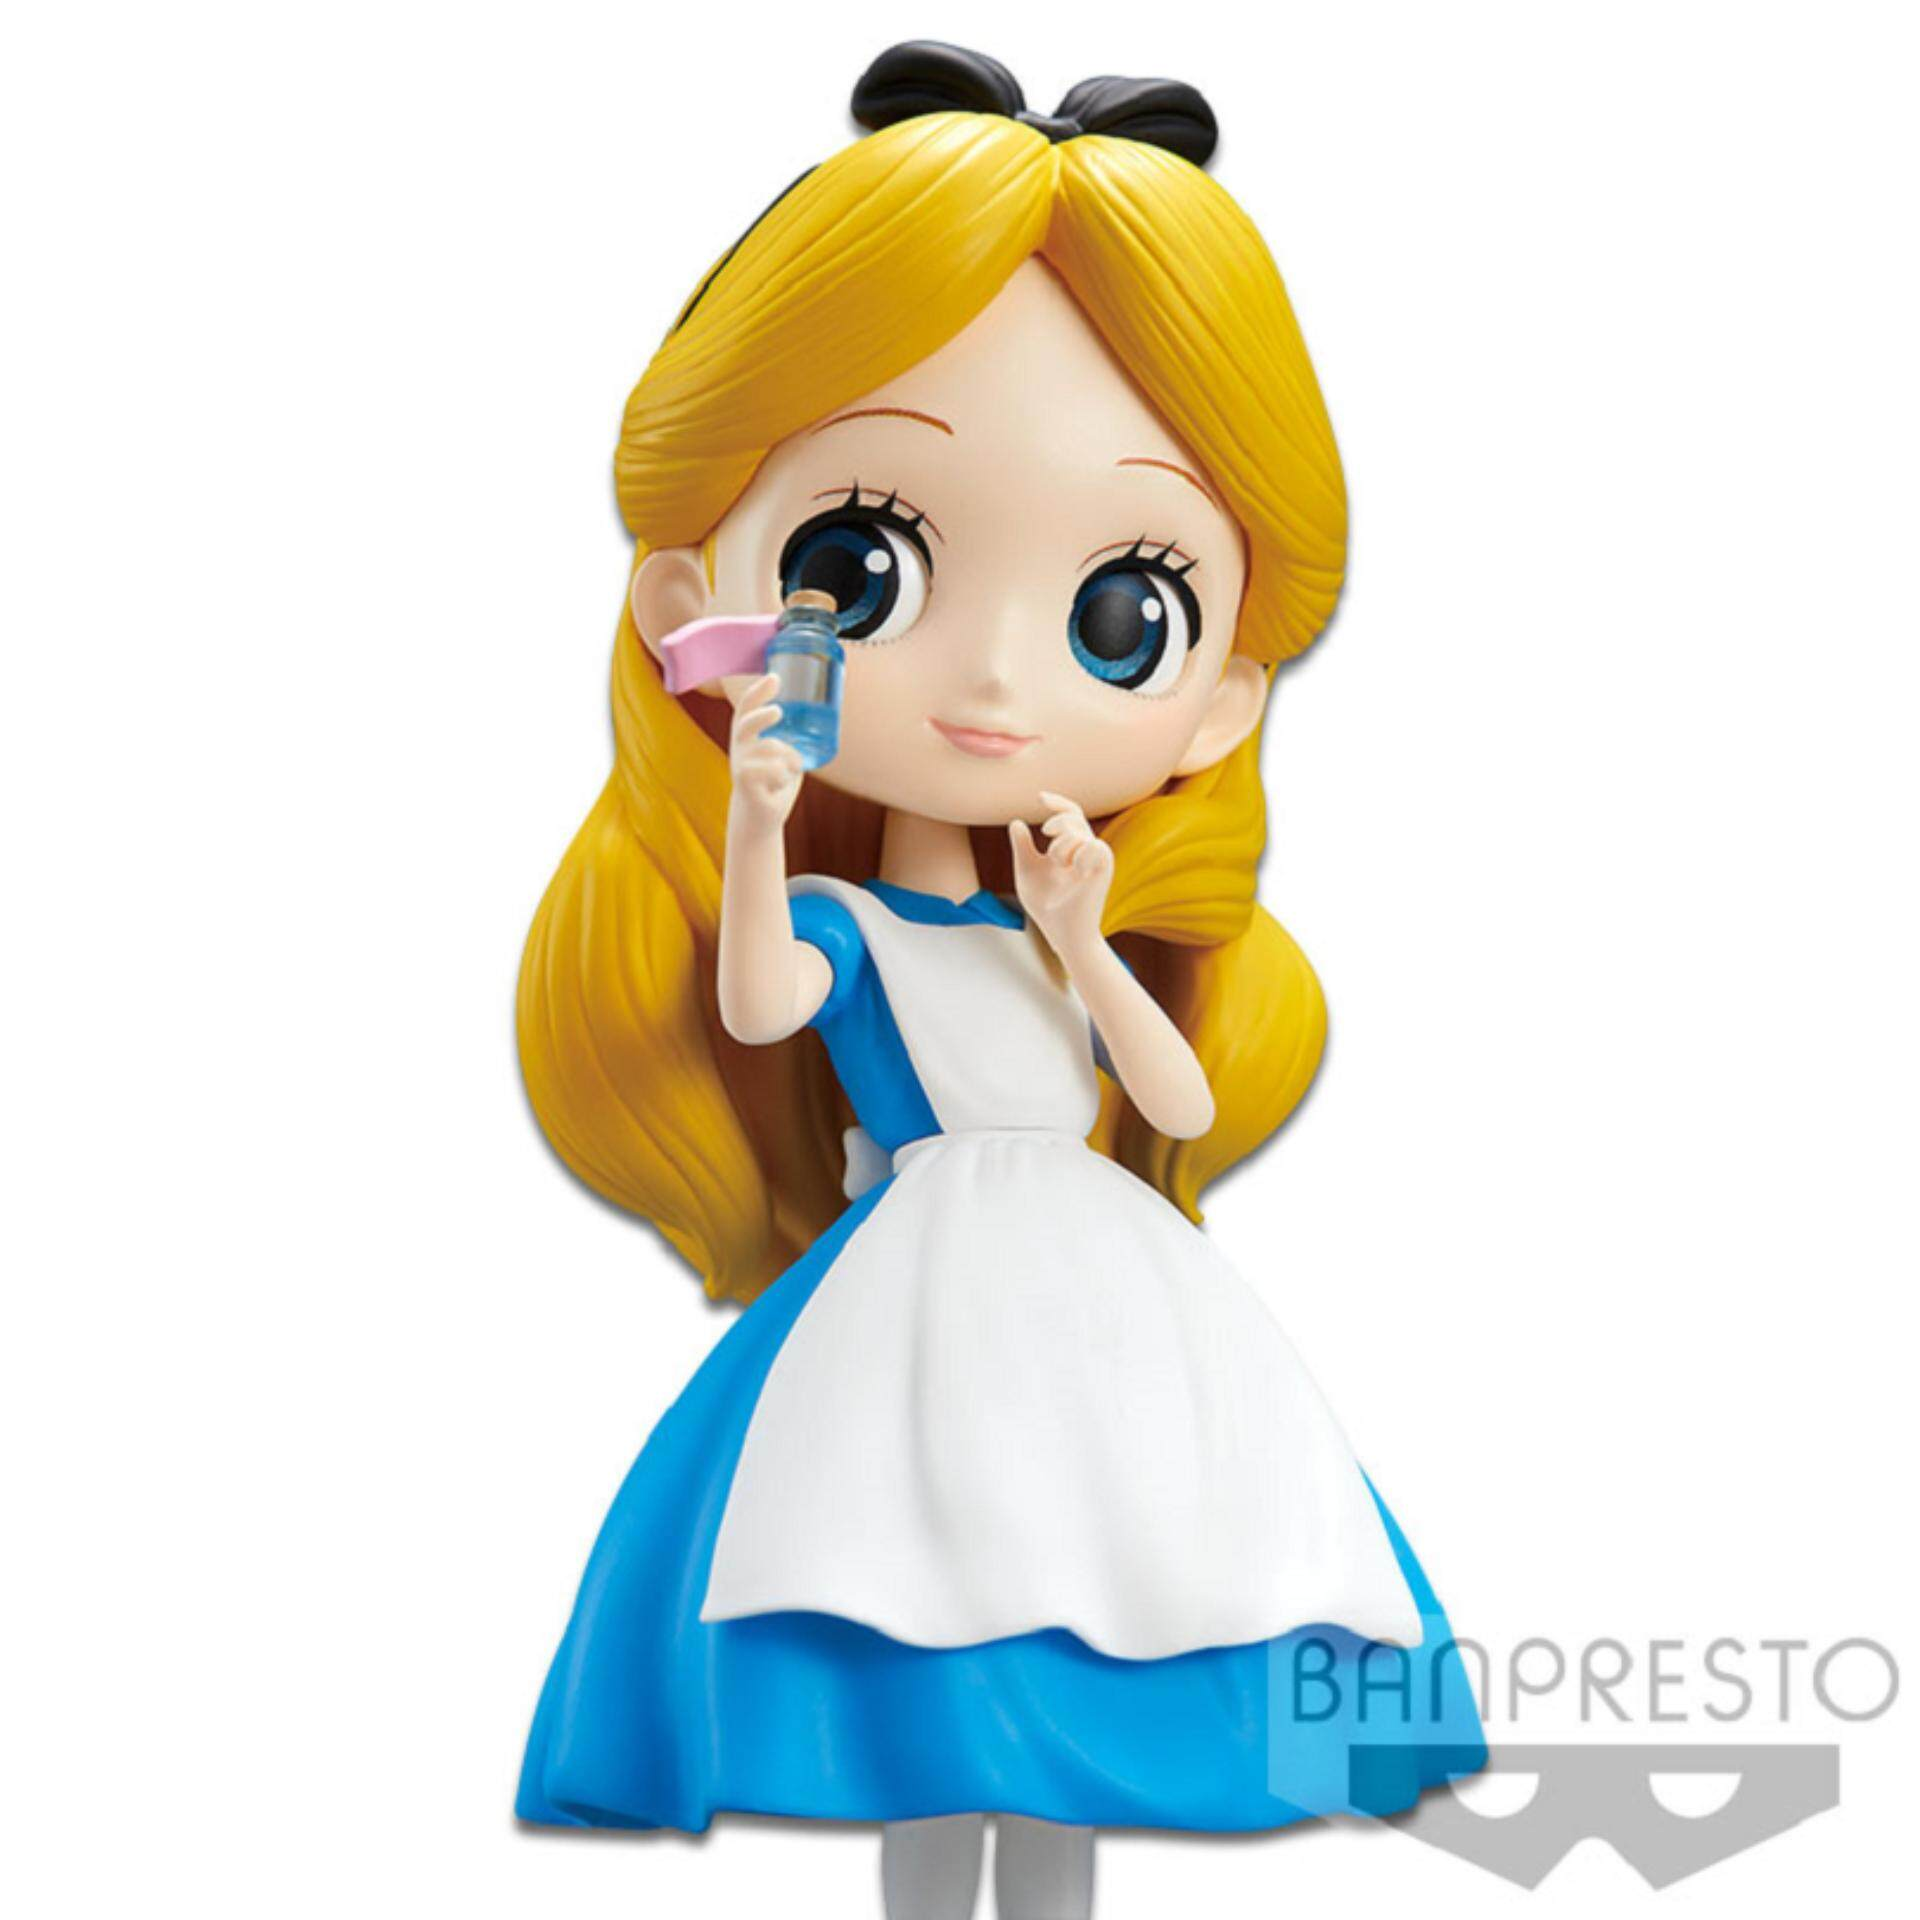 Banpresto Q Posket Disney Princess Figure Normal Version - Alice Thinking Time Toys for boys